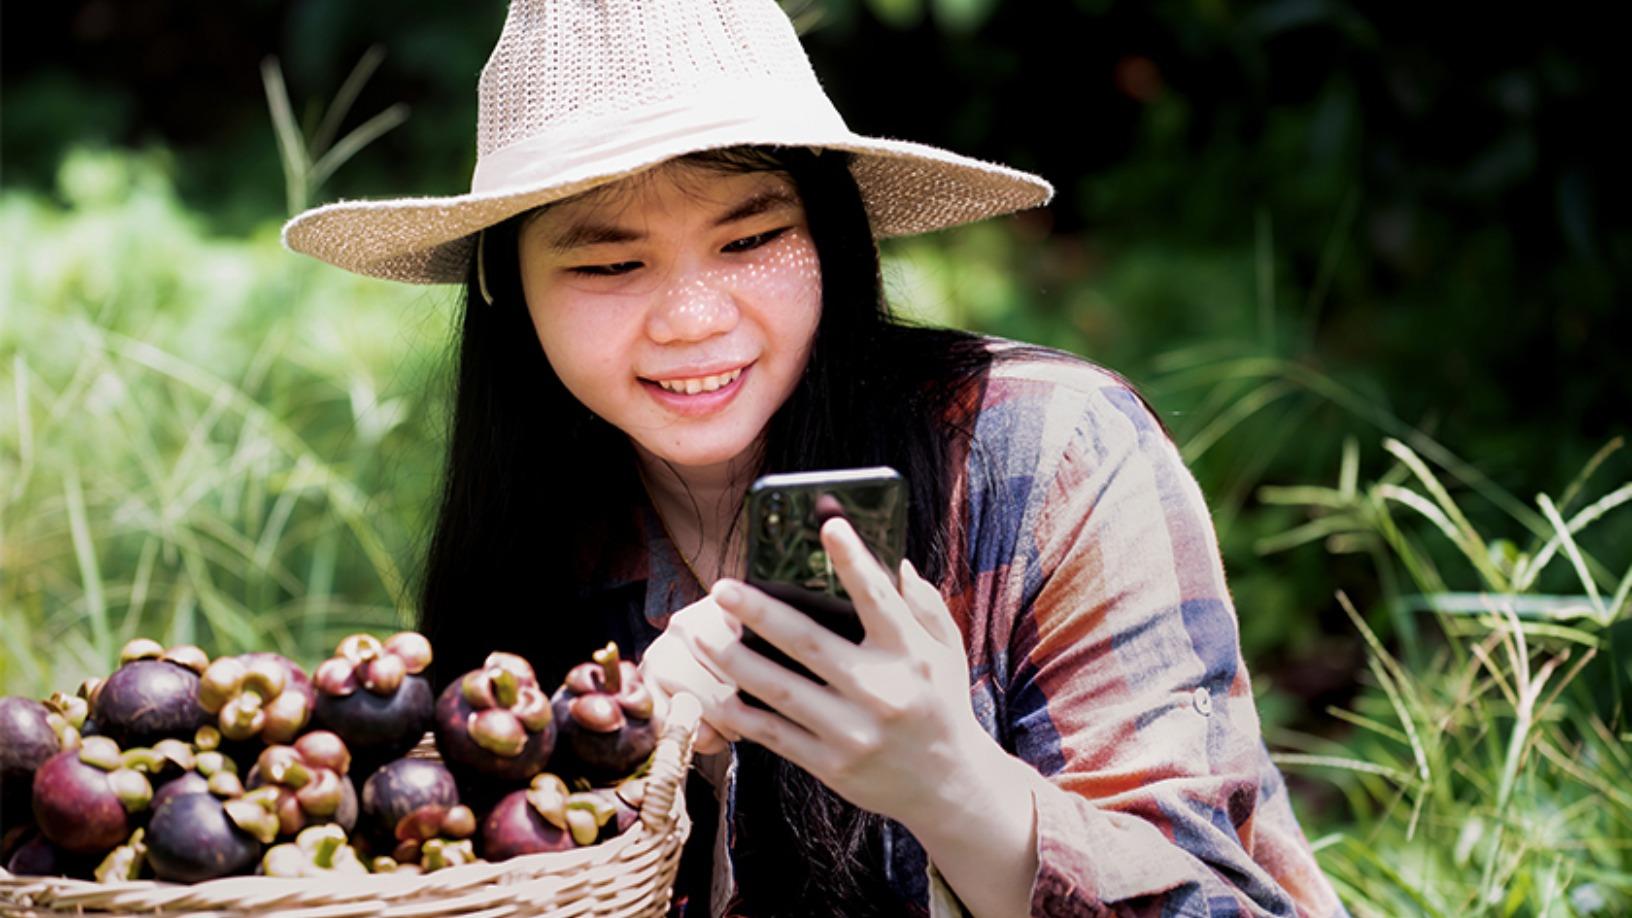 Kuaishou: Grabbing a share of China's near-trillion-RMB livestreaming e-commerce market